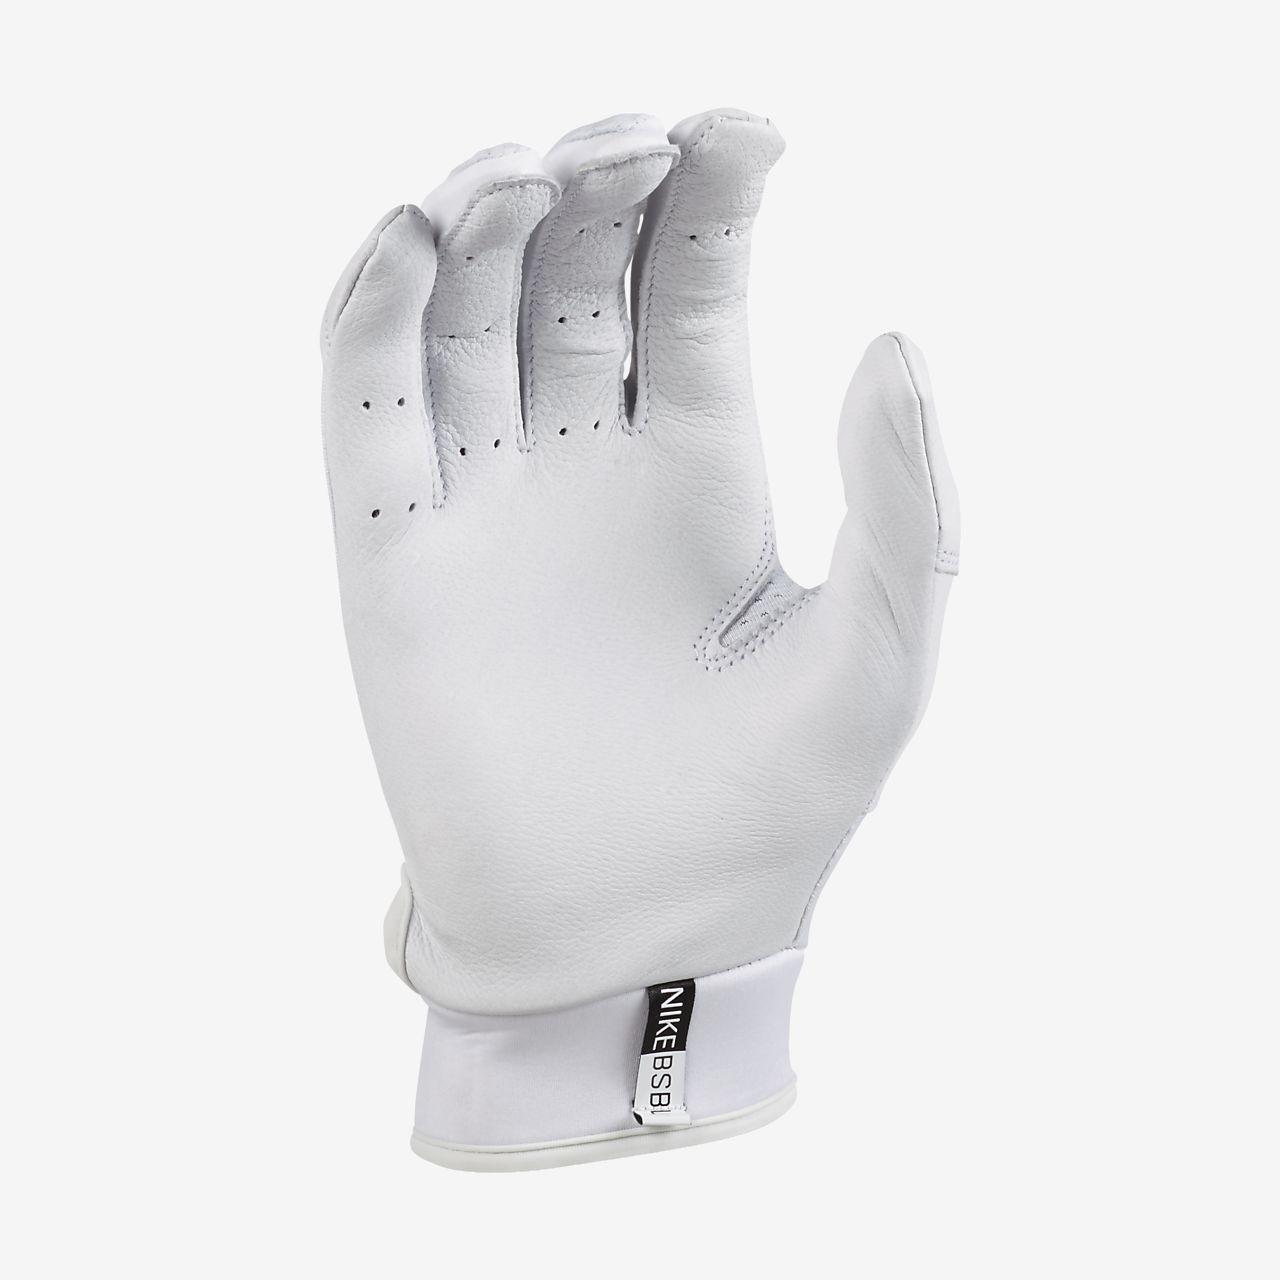 ... Nike MVP Edge Men's Baseball Batting Glove